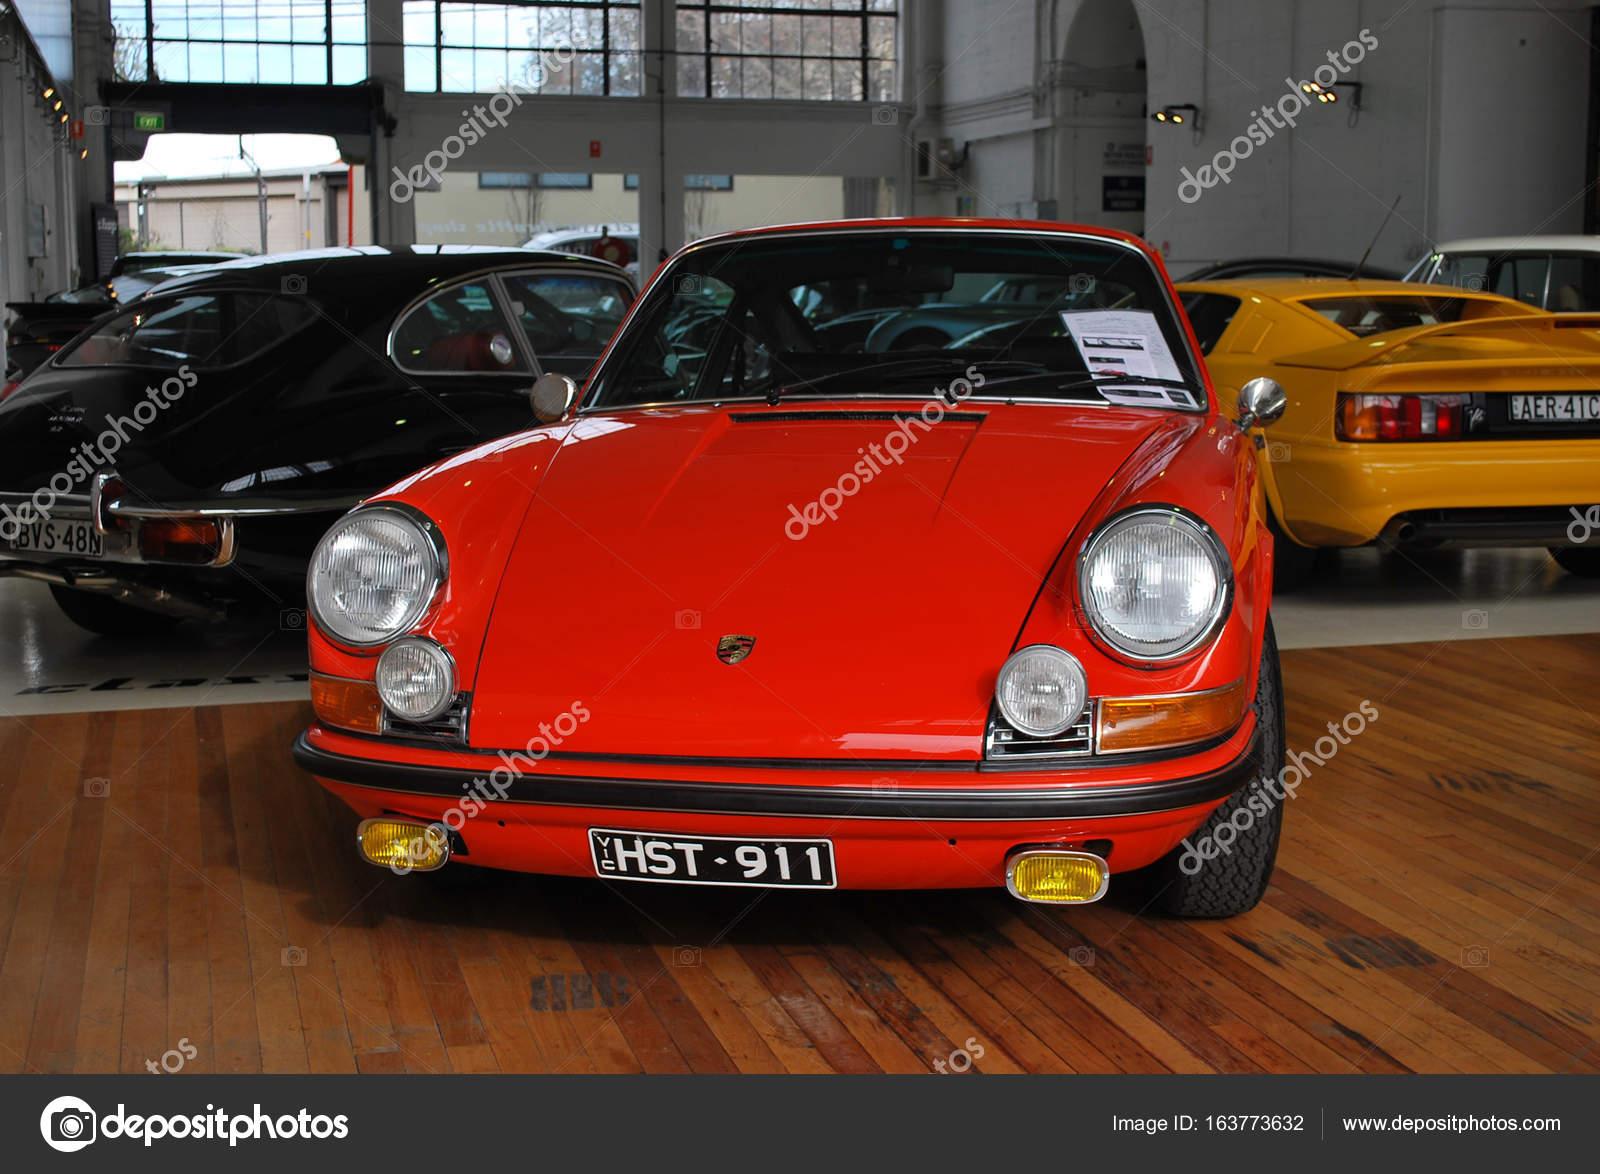 Fire red Porsche 911 Carrera car, old classic retro model on display ...